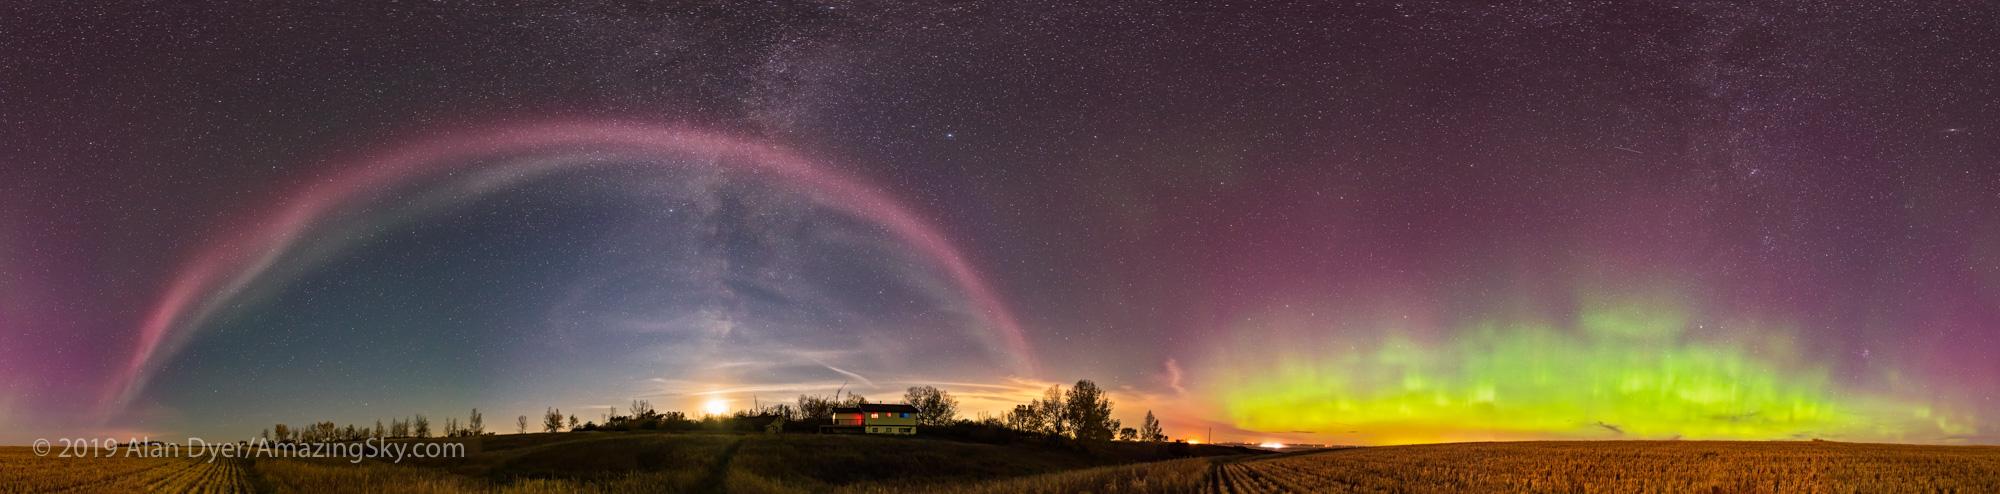 """Steve,"" the Strange Auroral Arc"